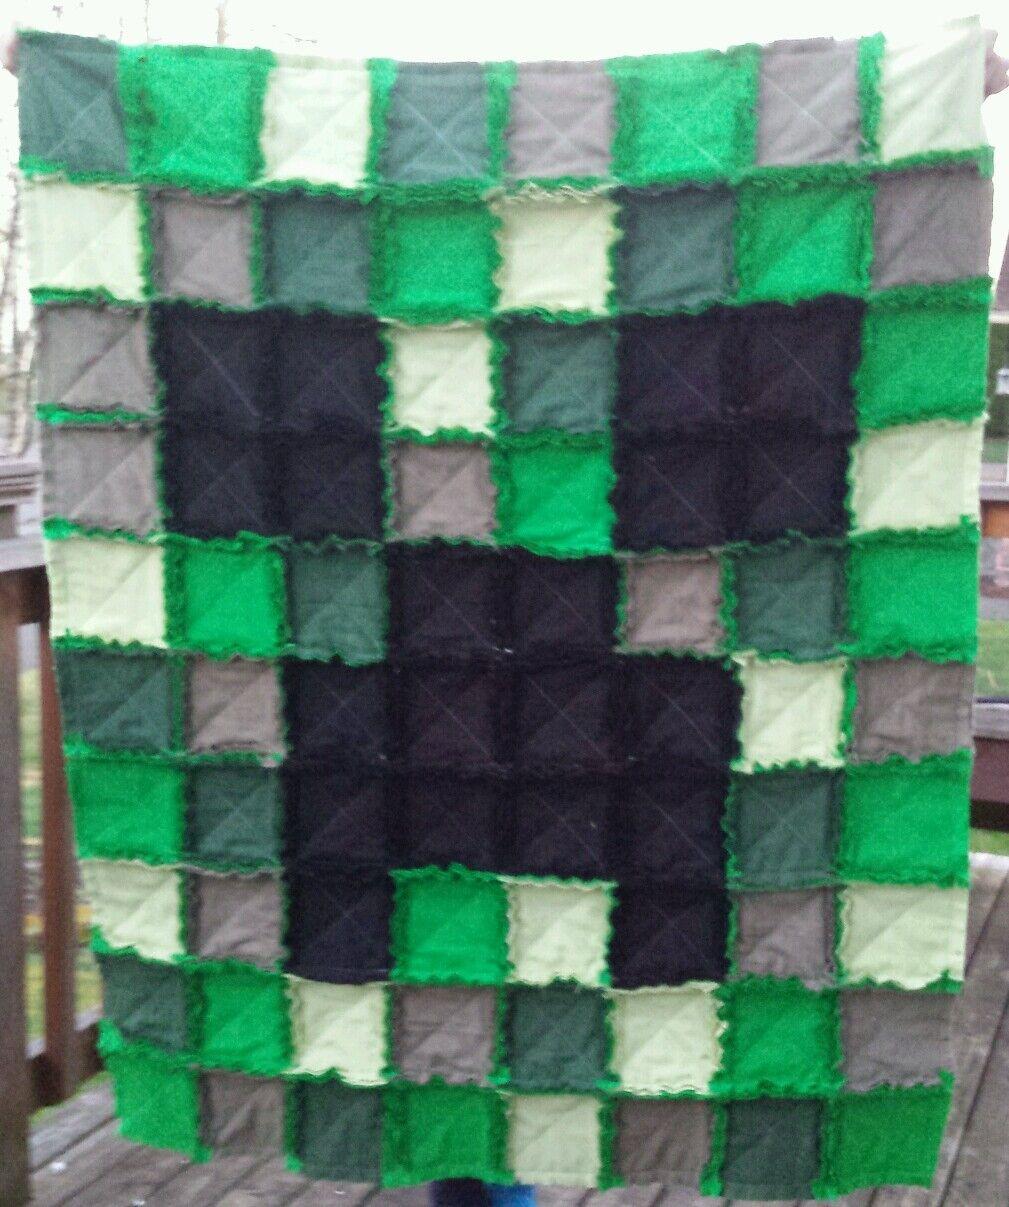 Minecraft Rag Quilt Blanket CREEPER character gift kids birthdayFREE SHIPPING